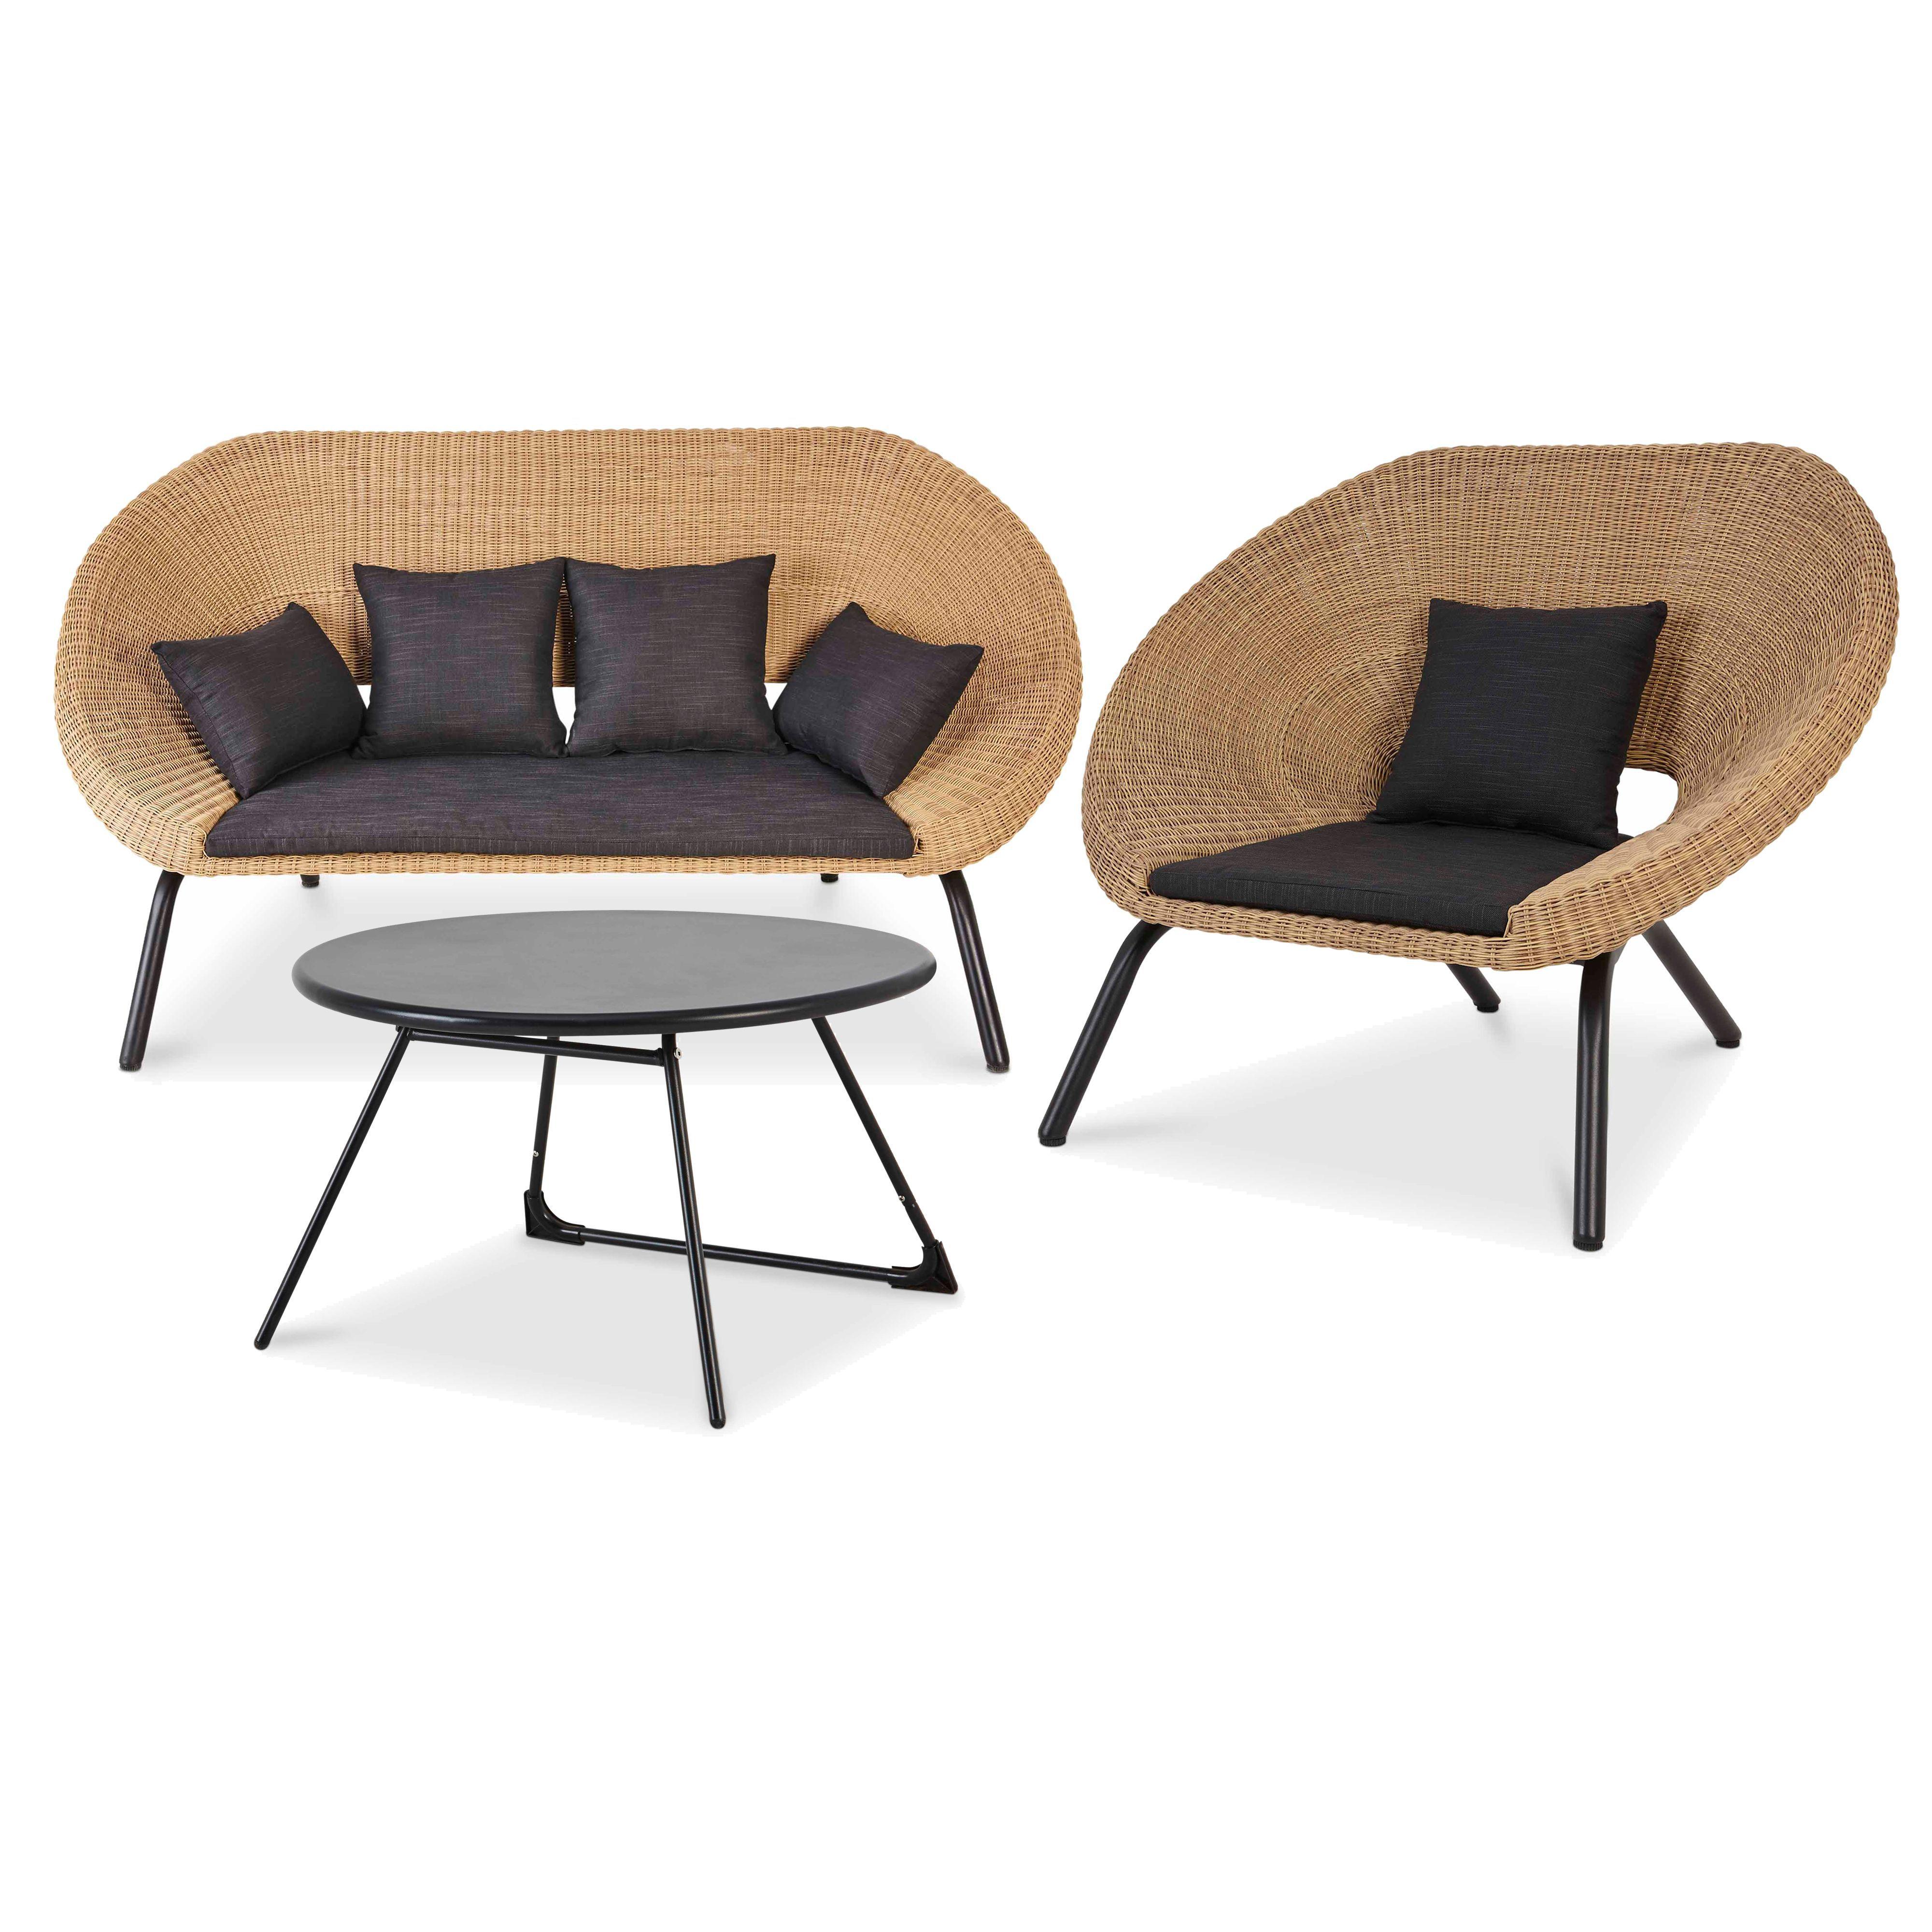 Loa Rattan 3 Seater Coffee Set